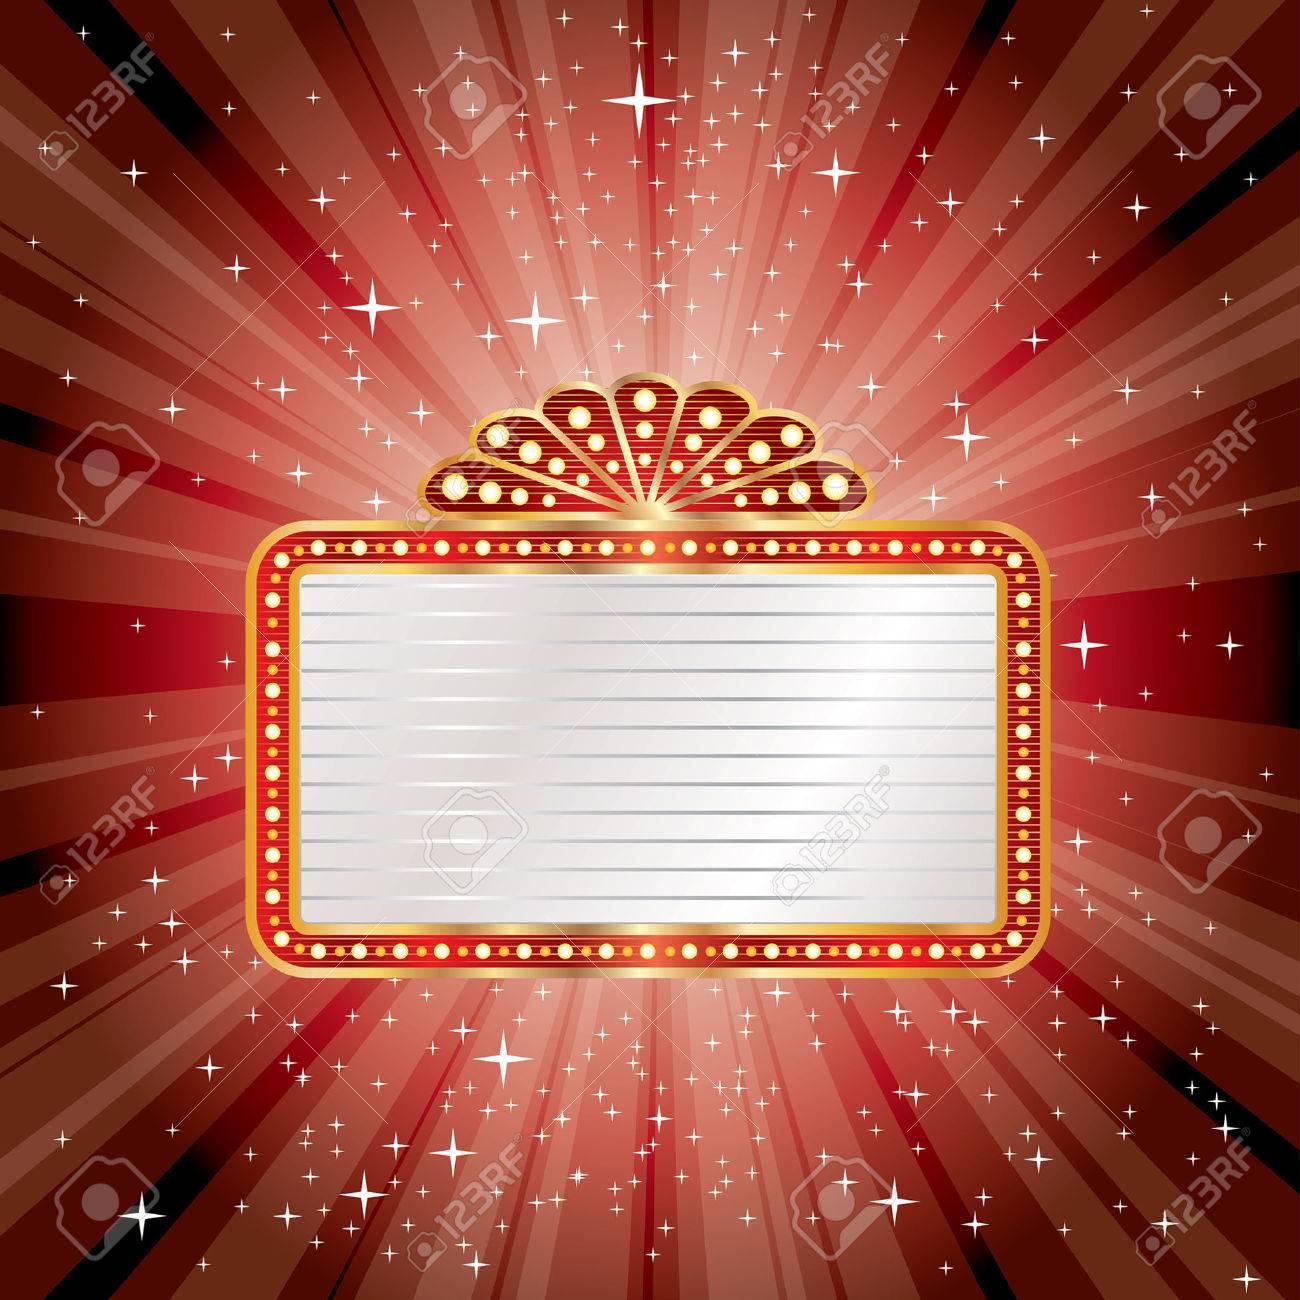 vector red starburst with blank billboard - 34197431